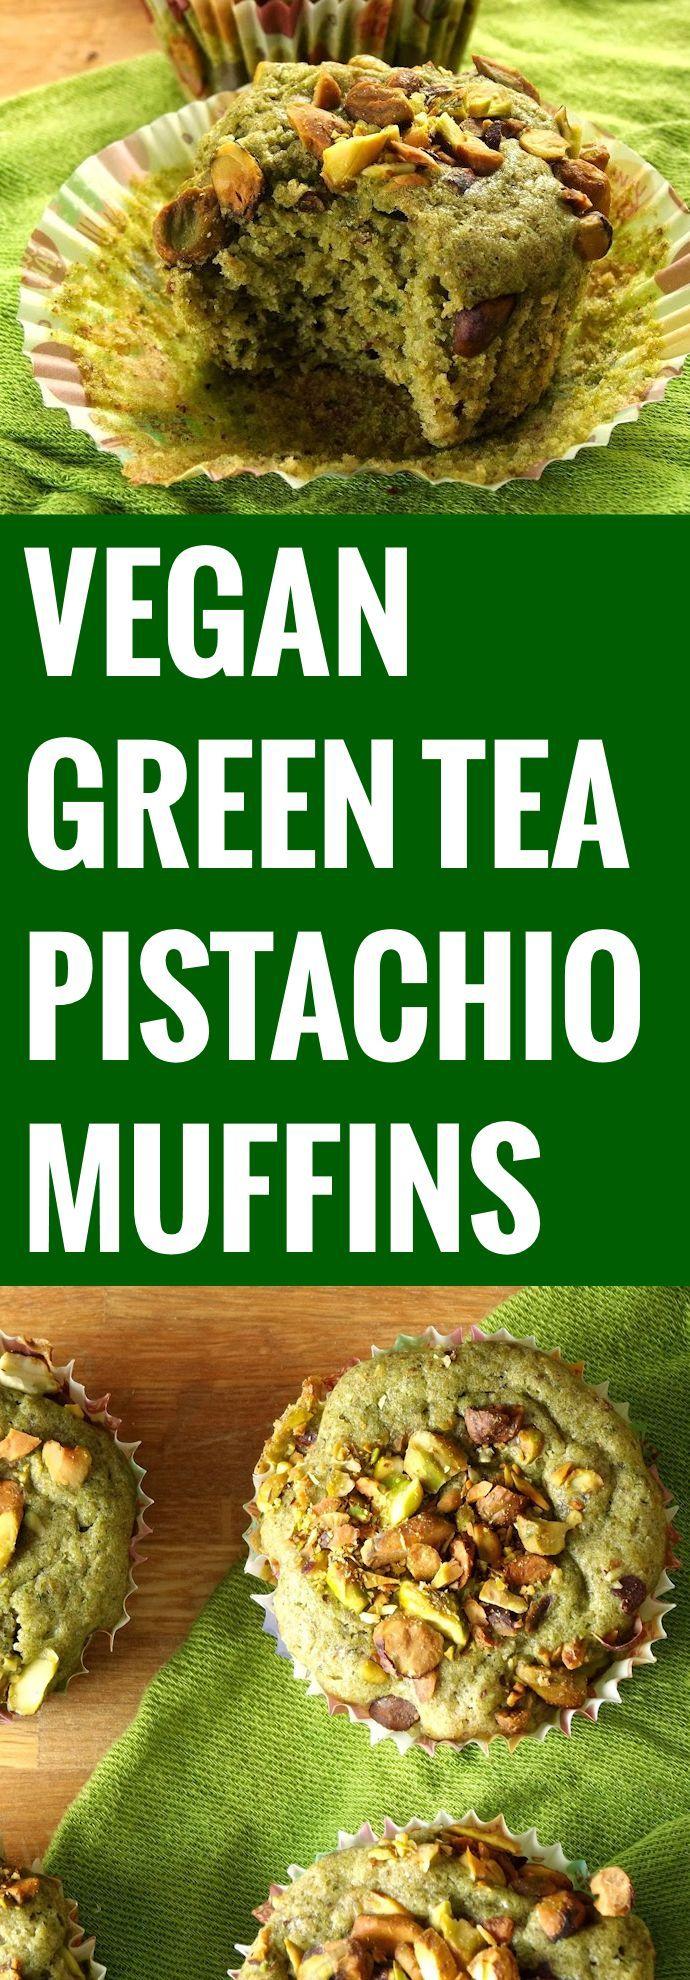 Green Tea and Pistachio Muffins // ground flaxseeds, plain non-dairy milk, plain or whole wheat pastry flour, baking powder, matcha green tea powder, lemon zest, ground cinnamon, nutmeg, vegan margarine, sugar, vanilla extract, pistachios